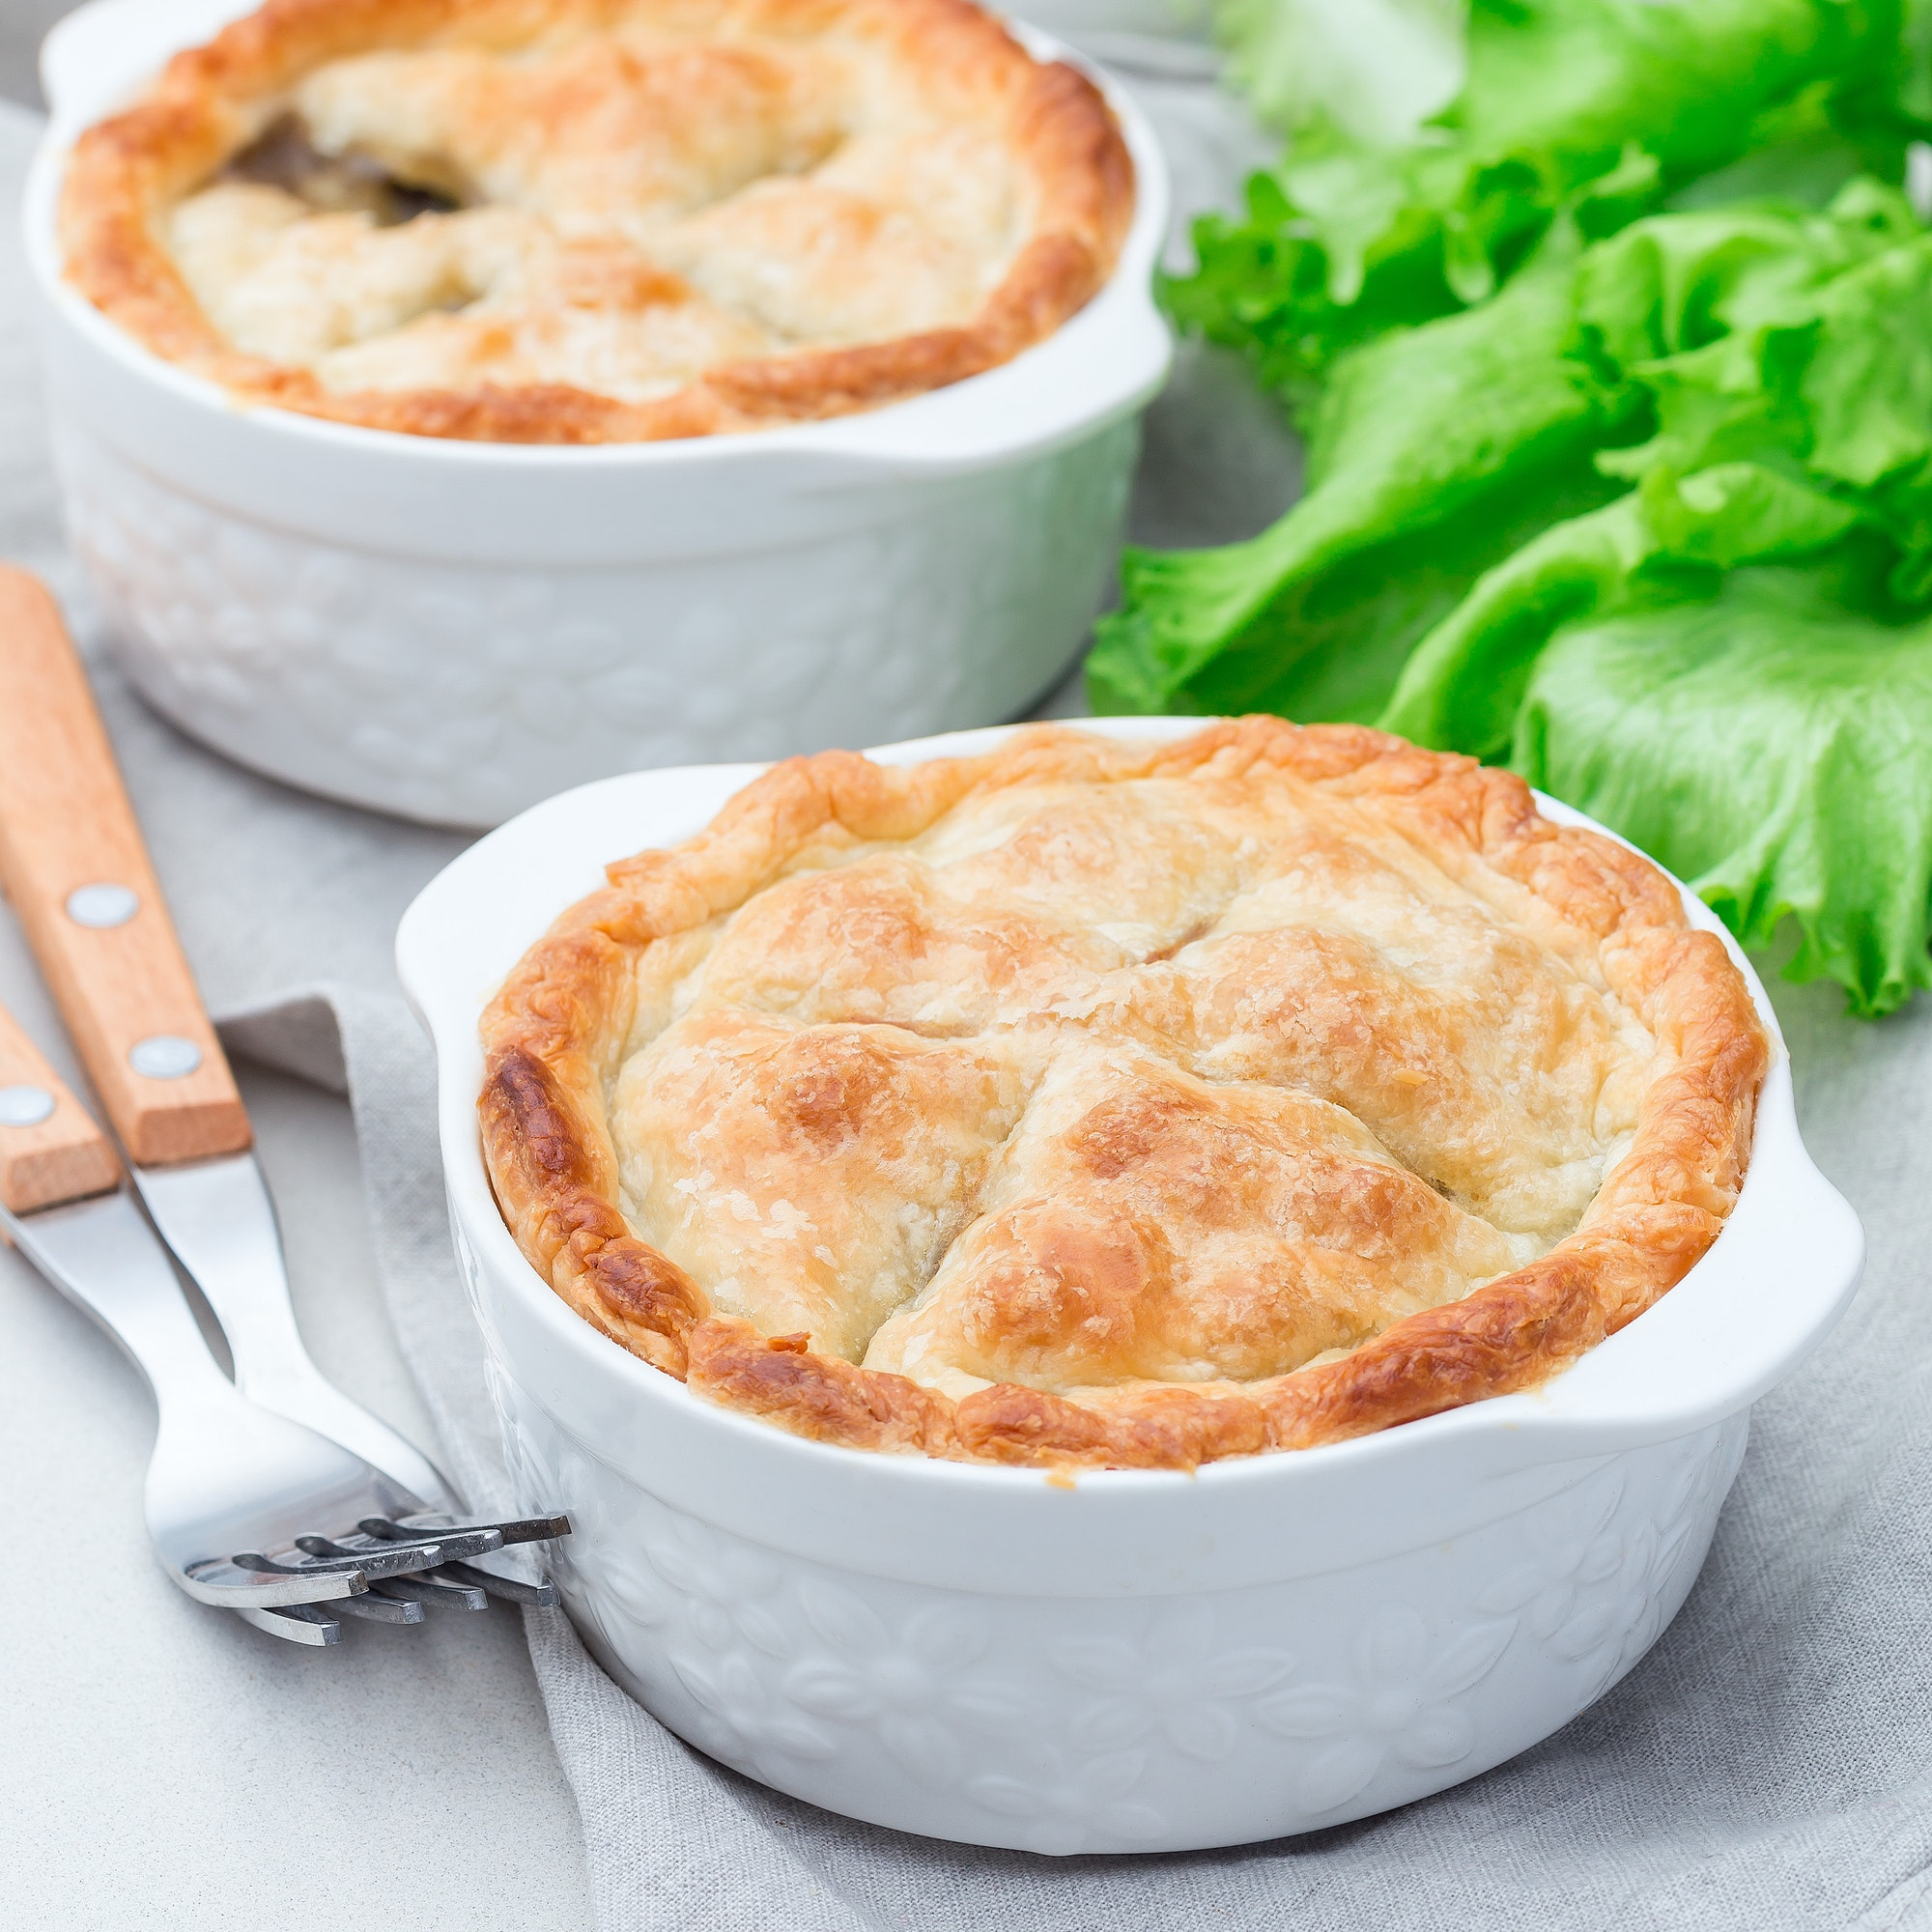 Vegetarian pot pie with lentil, mushroom, potato - contnental breakfasts